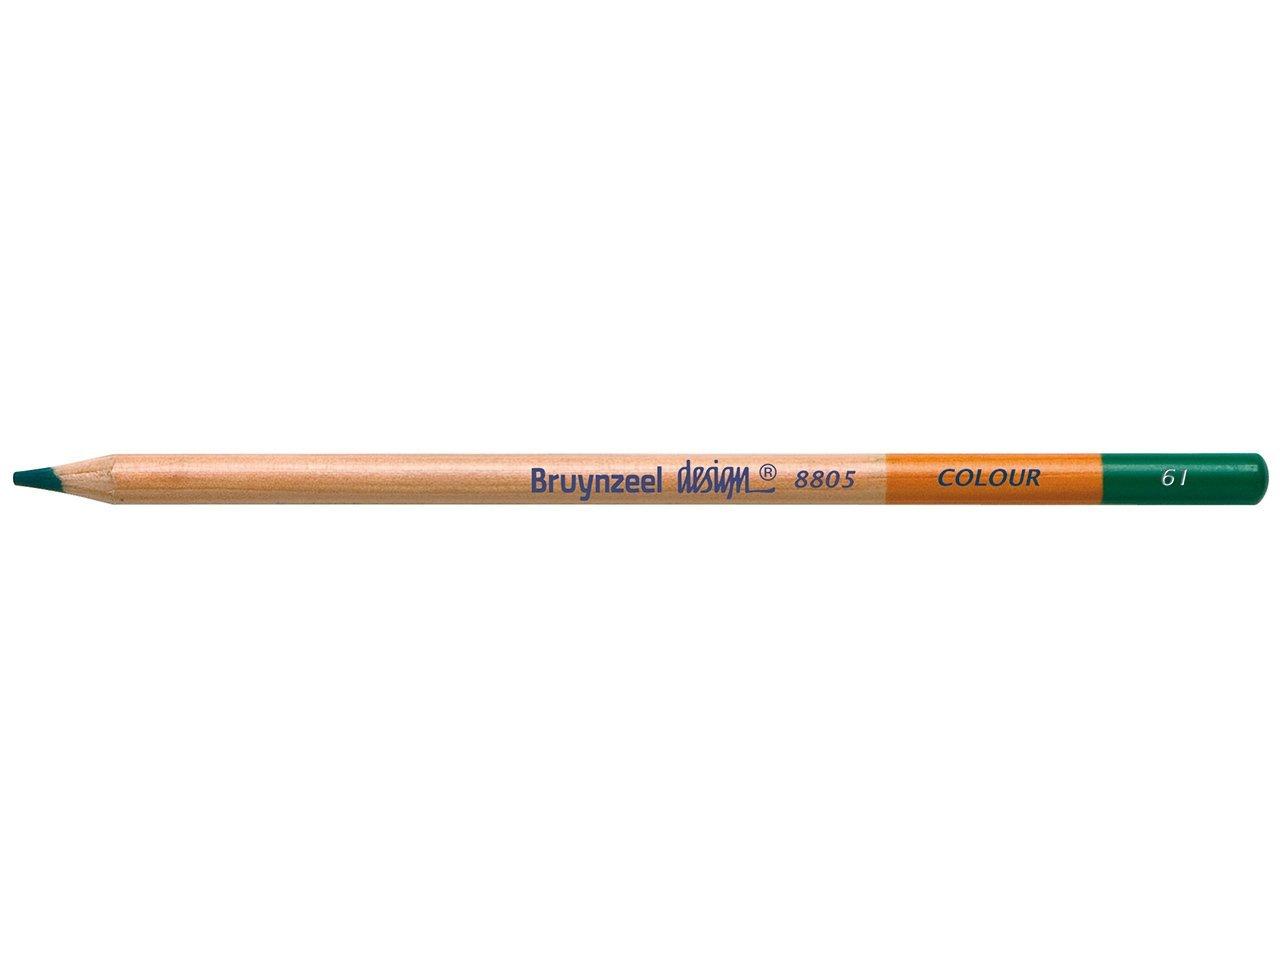 Bruynzeel Pencil - 61 Dark Green